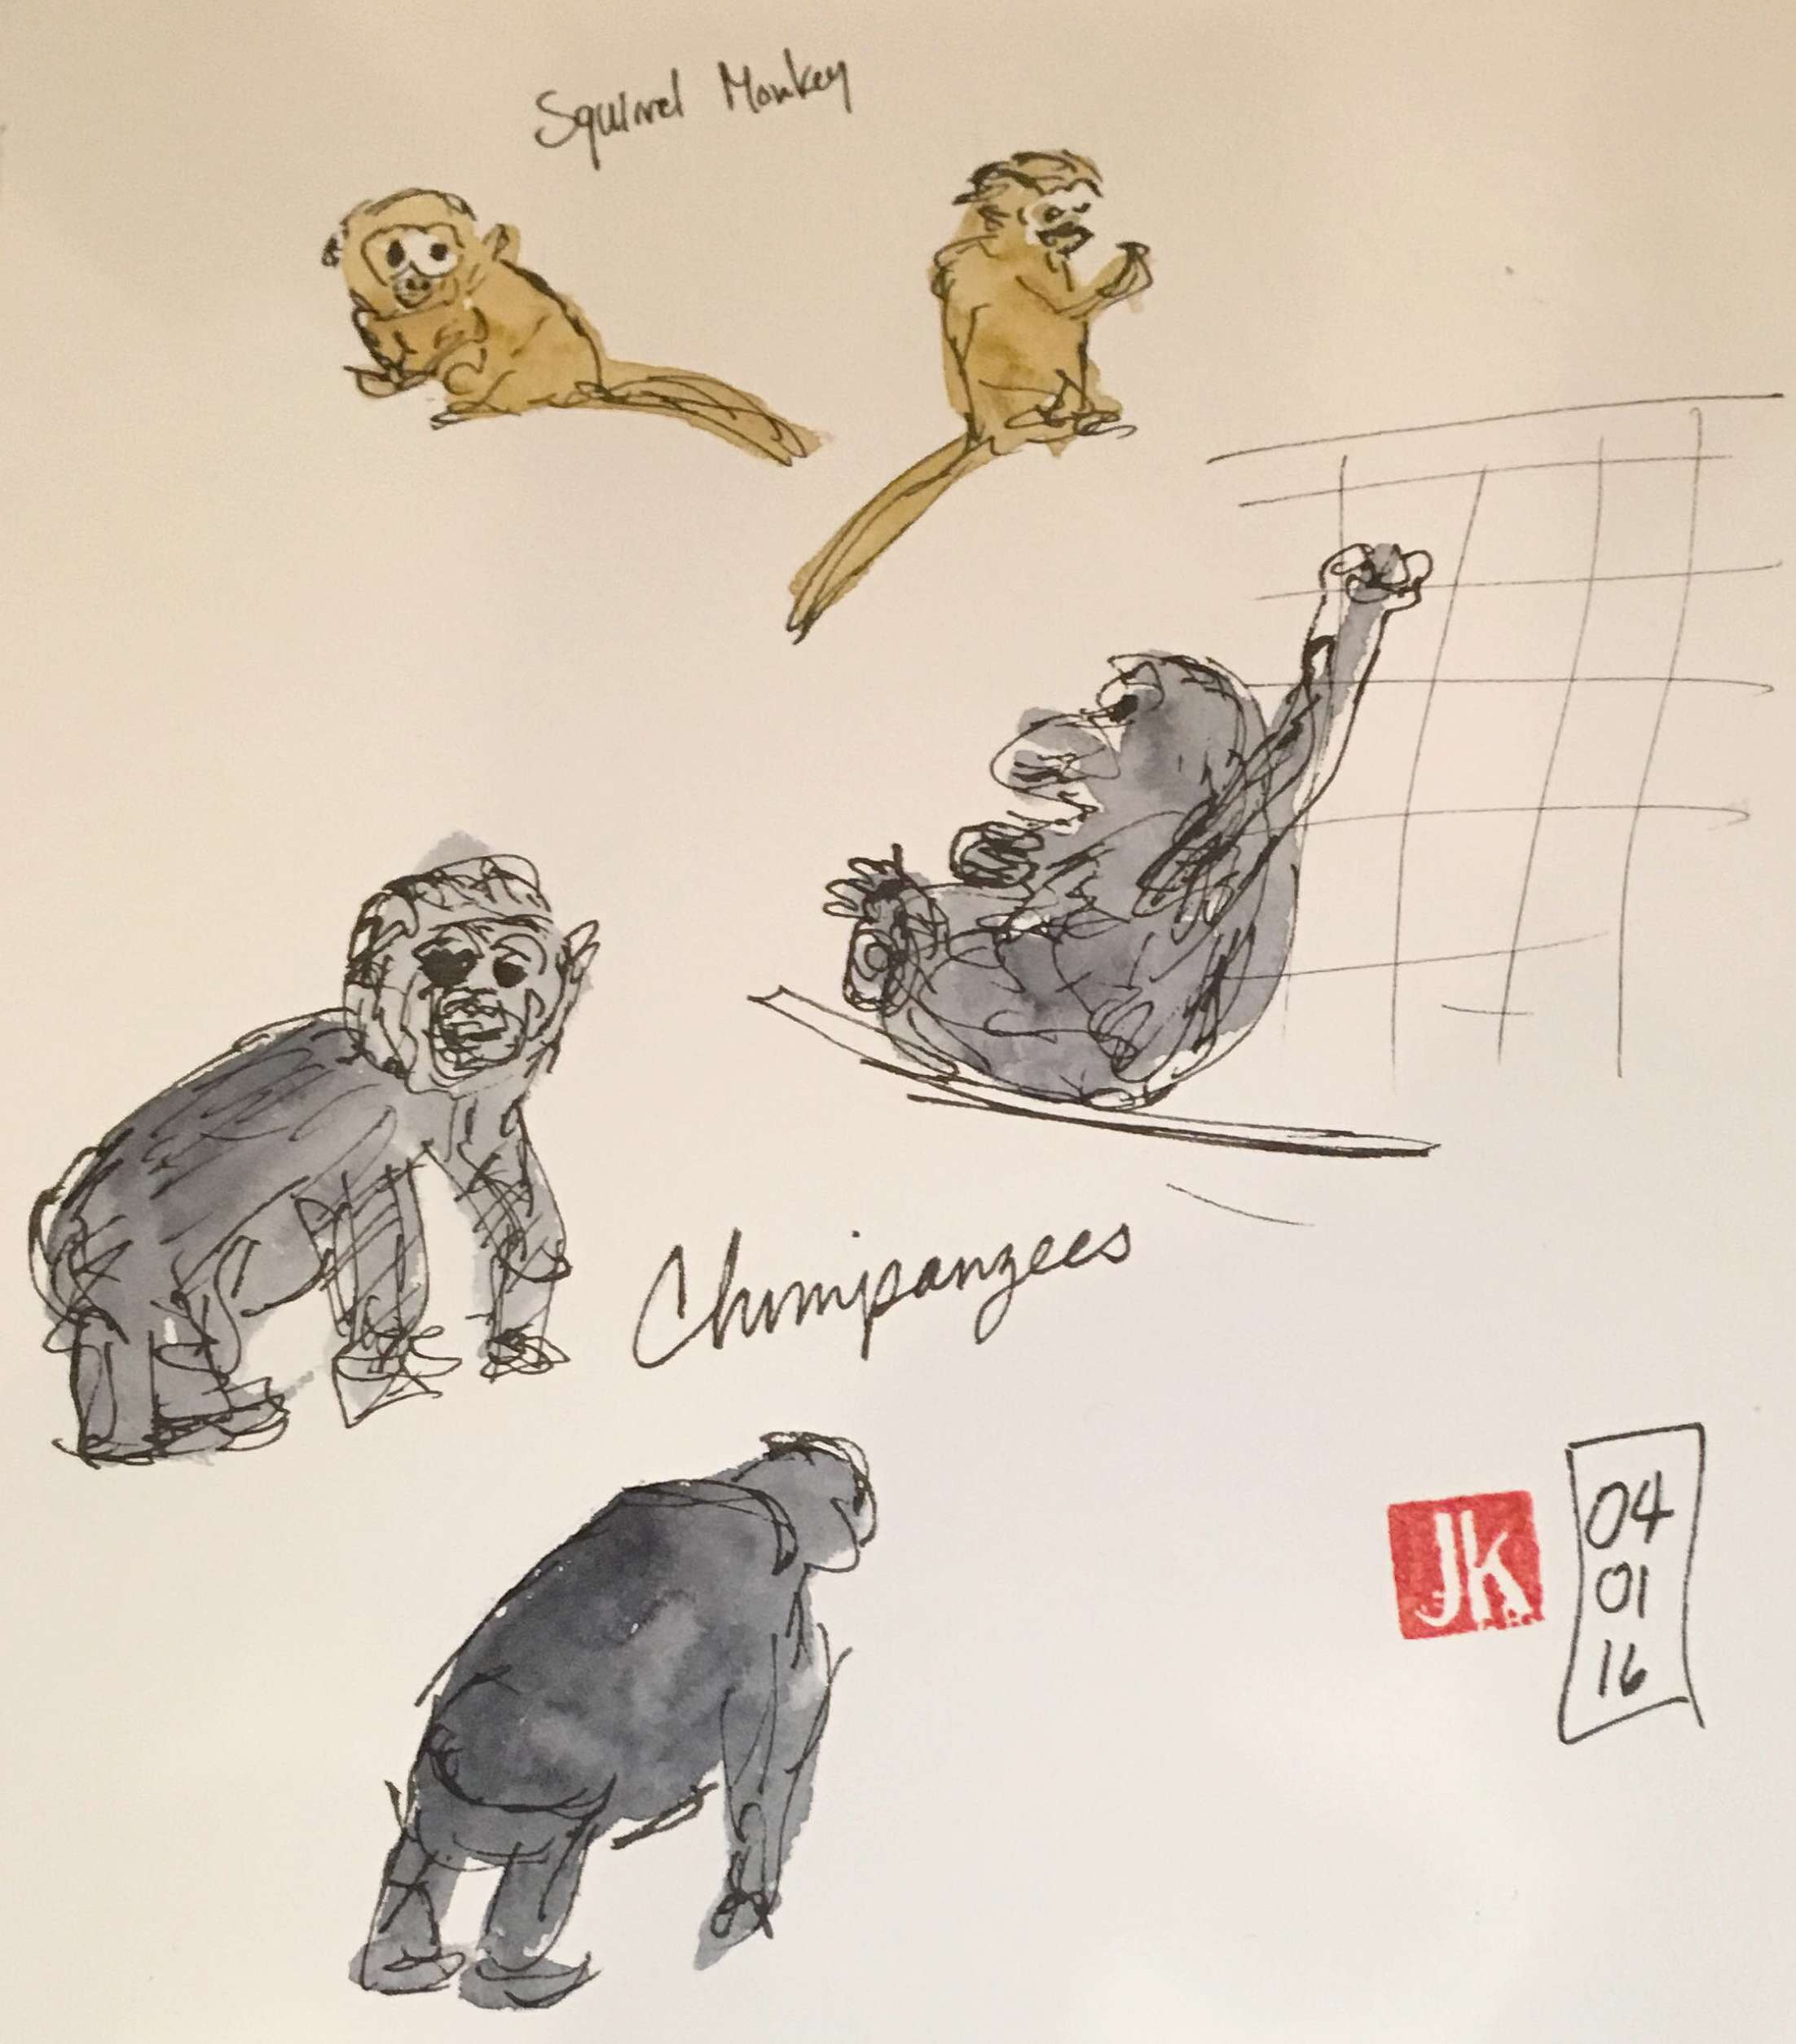 Squirrel monkeys & chimpanzees